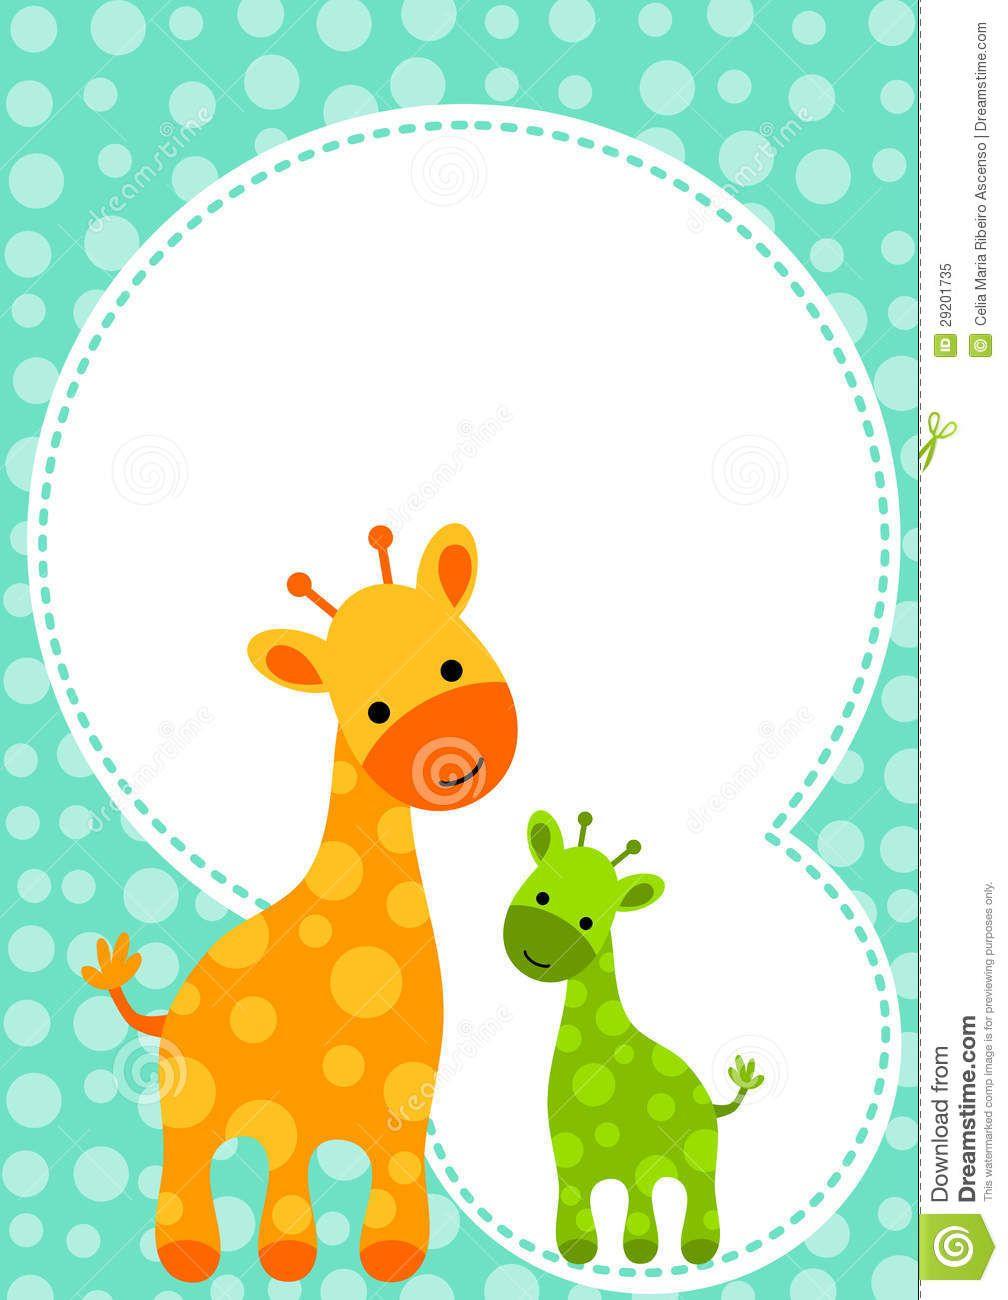 Giraffe clipart baby shower giraffe #14   First Birthday party ...